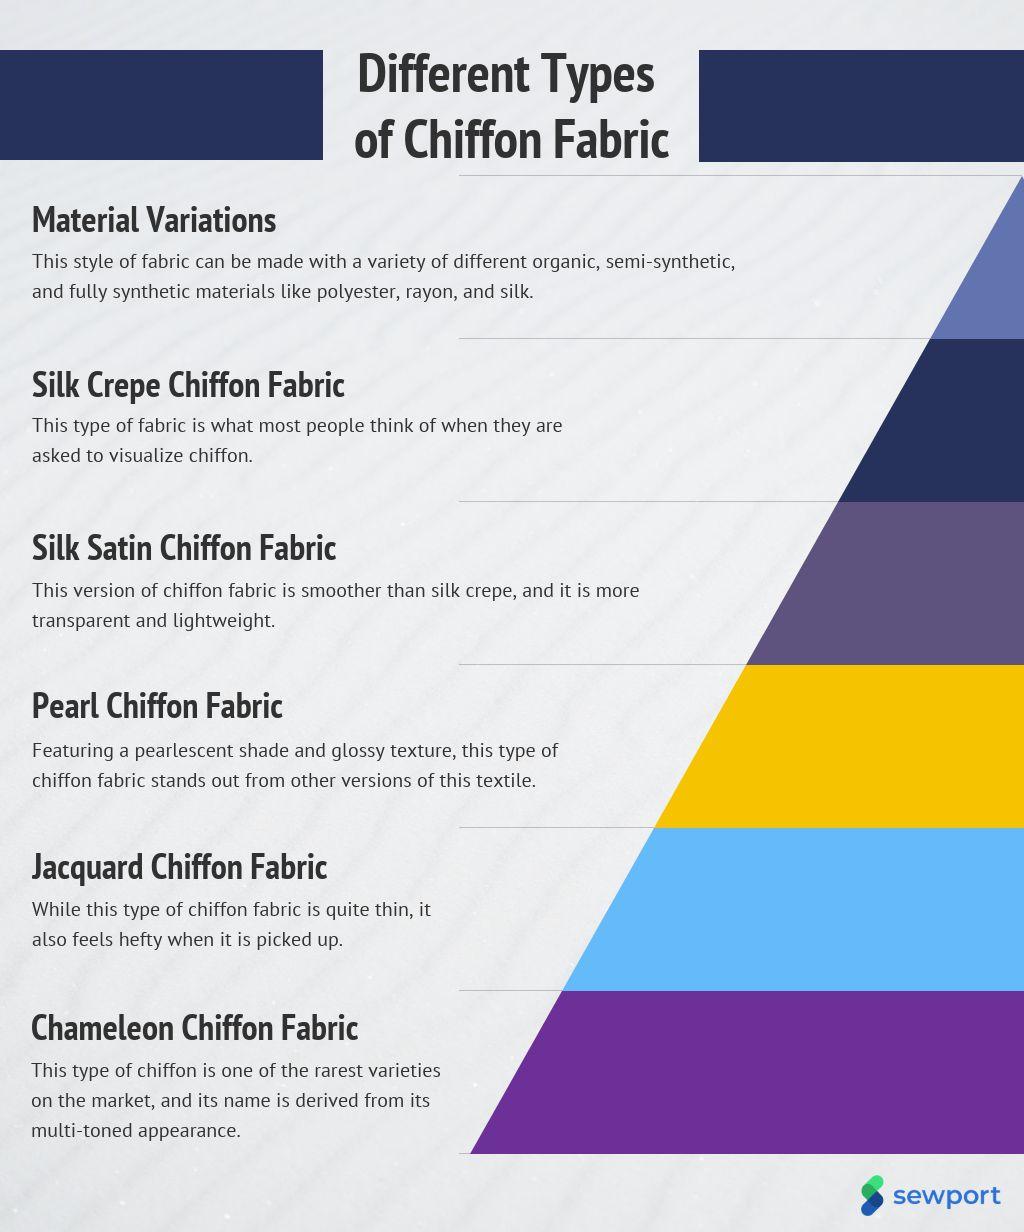 different types of chiffon fabric